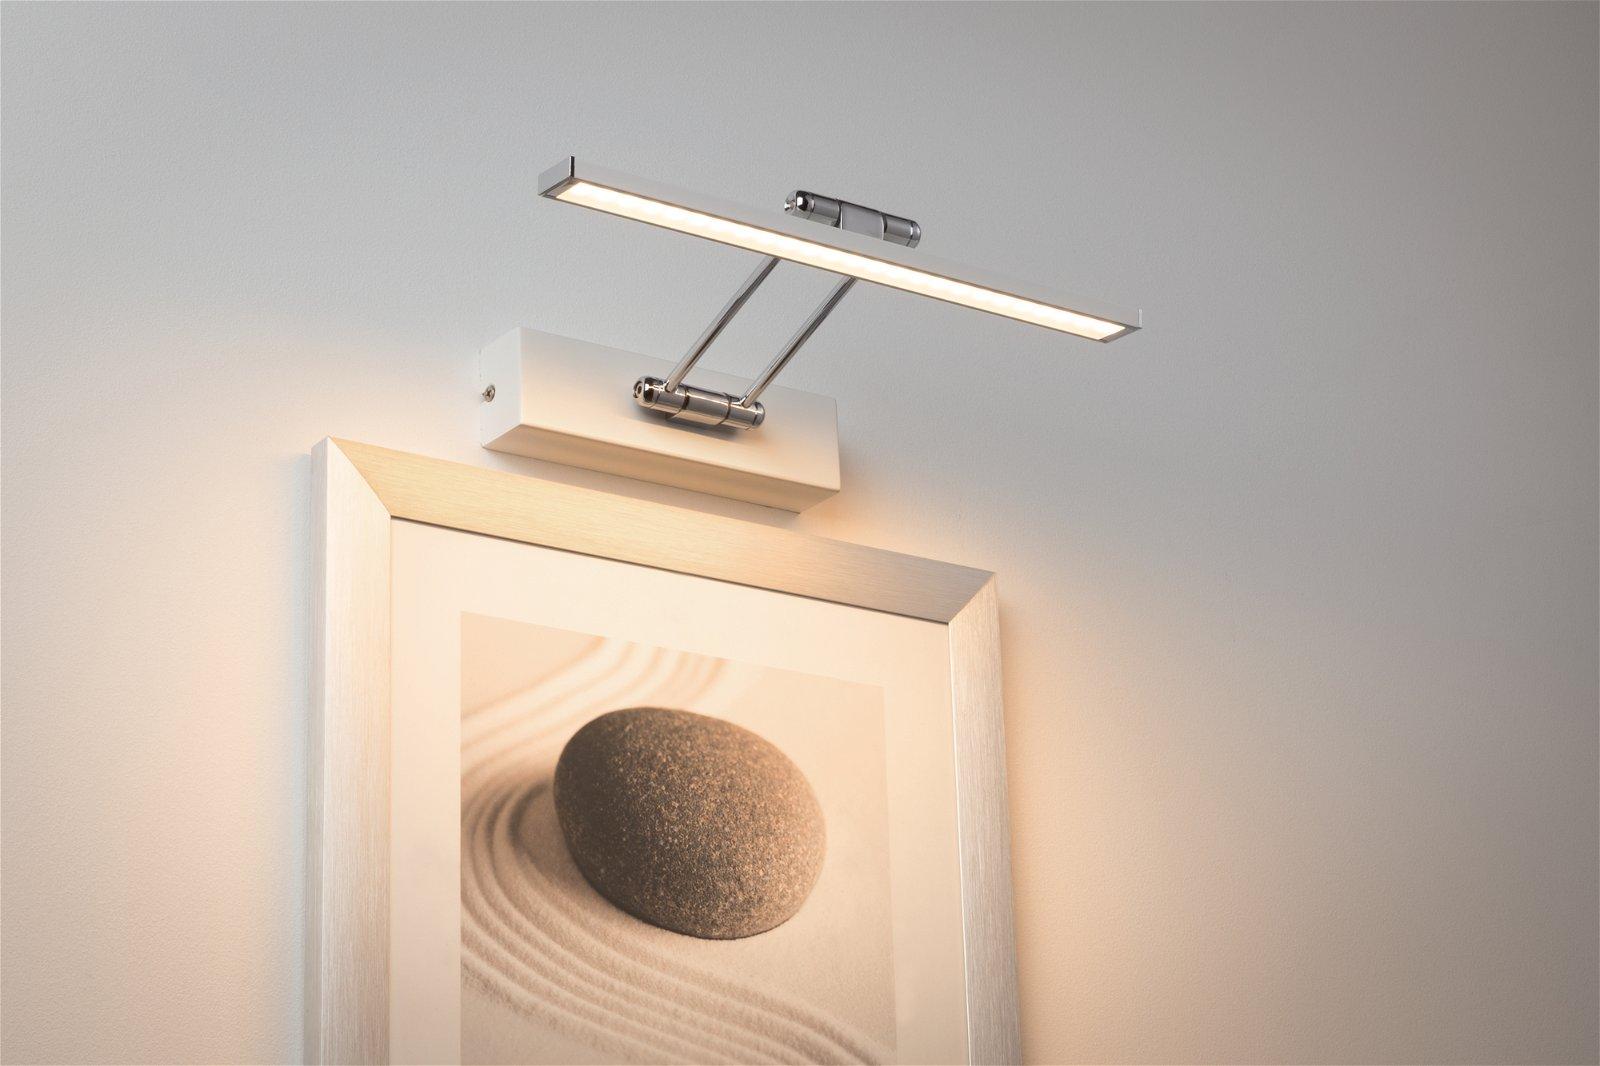 Galeria LED Bilderleuchte Beam 2700K 630lm 230V 5W Weiß/Chrom